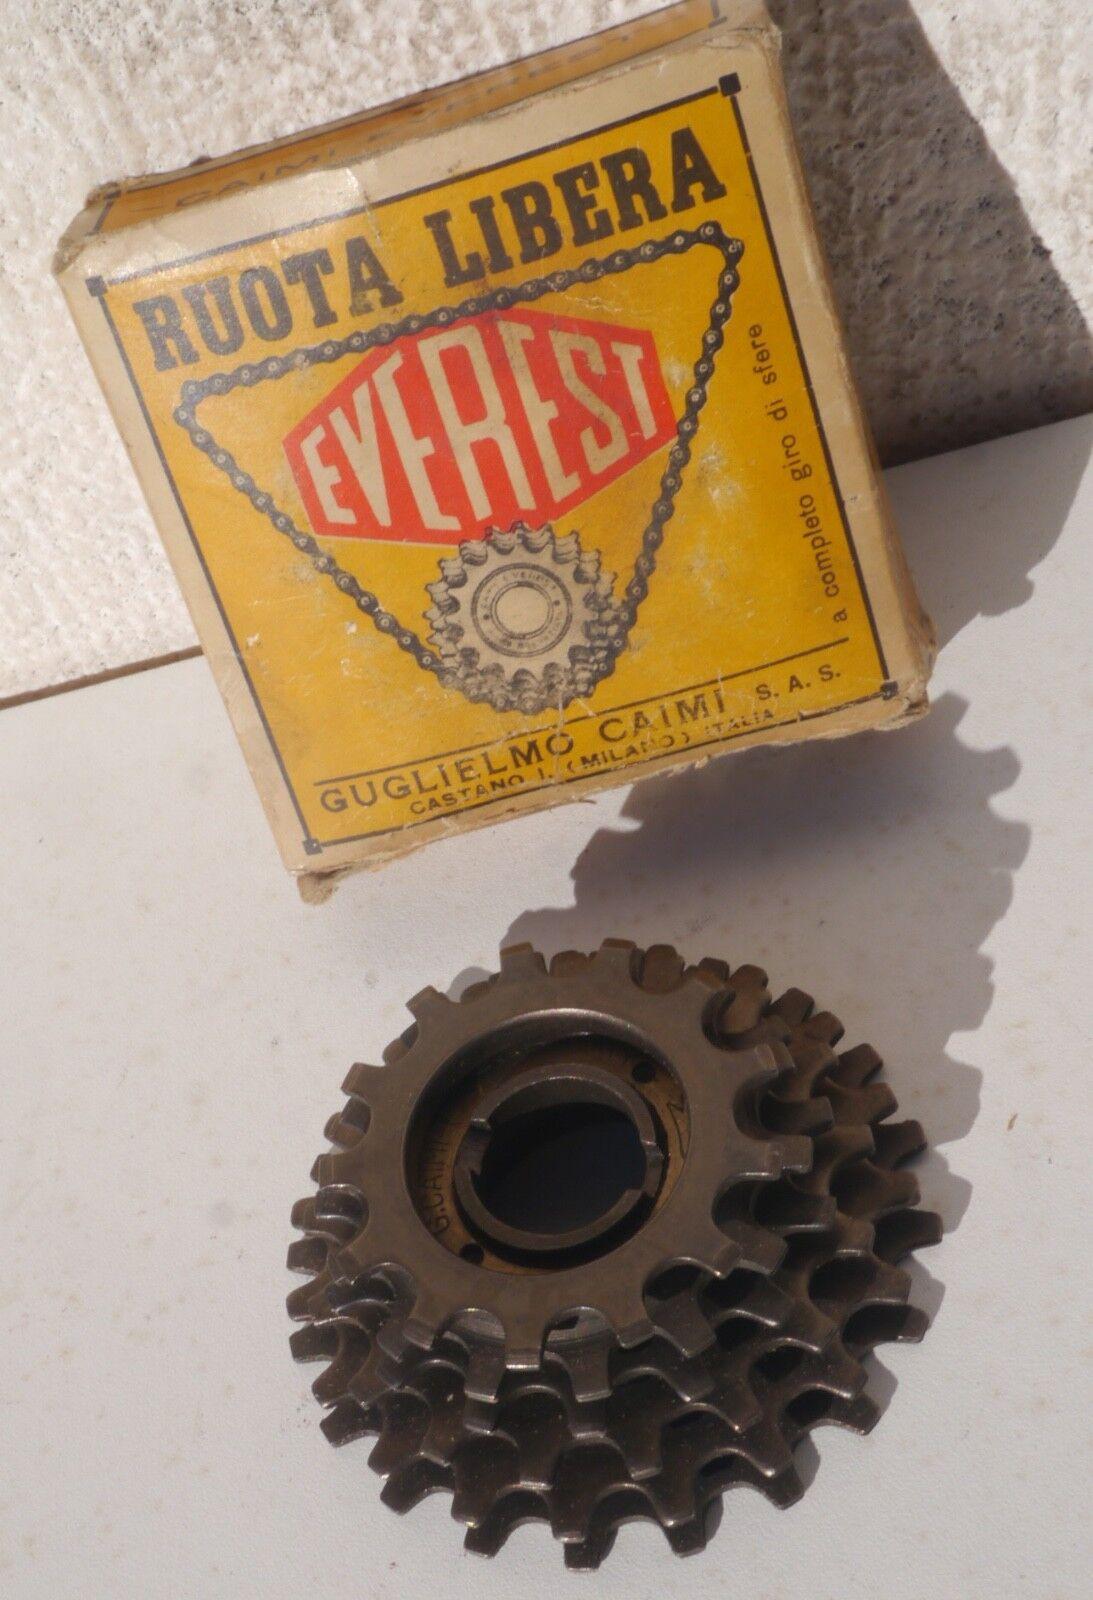 NIB Caimi Everest Special Corse 6s 1320 freewheel, for vintage road bike